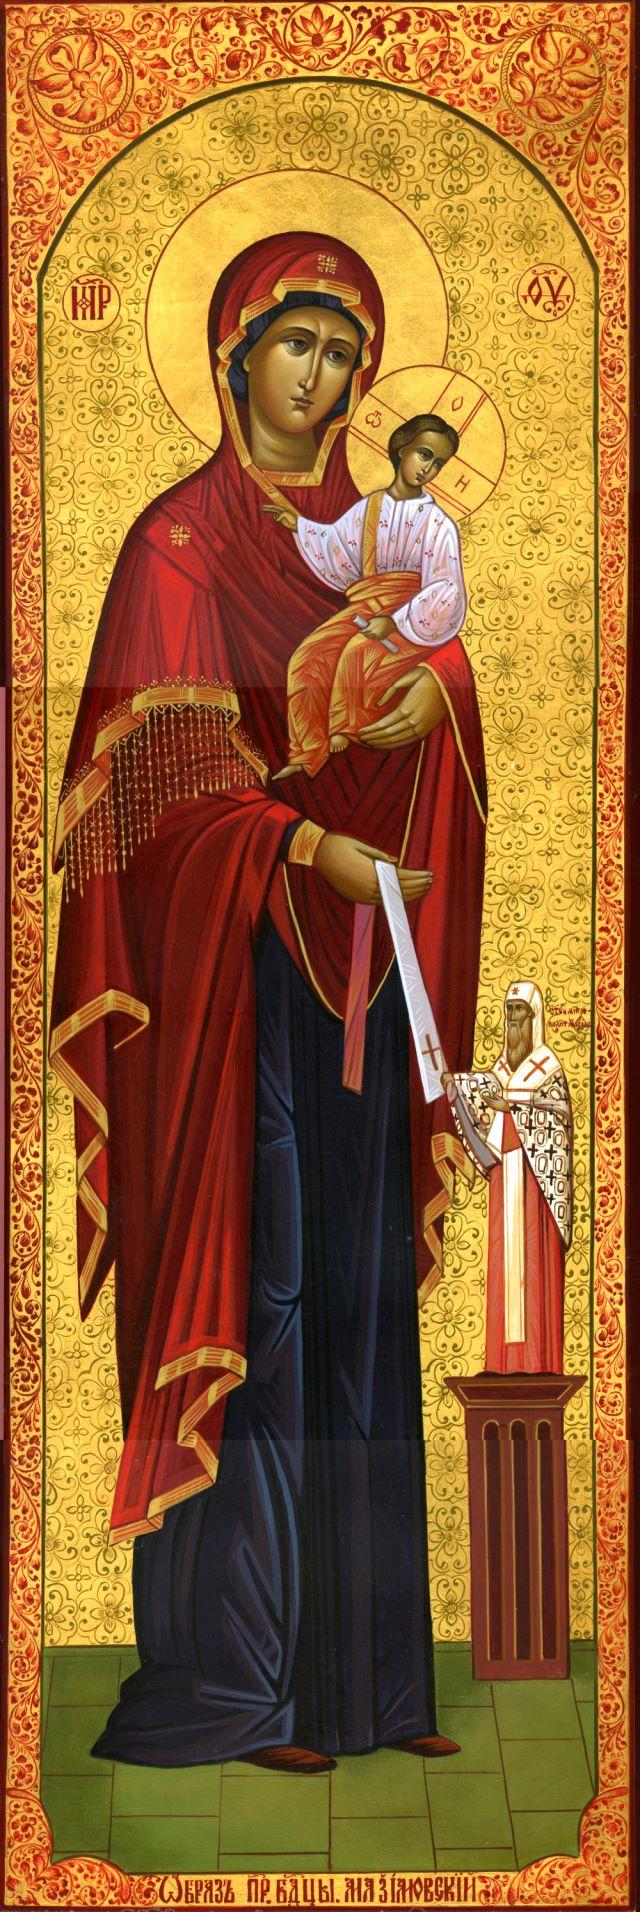 ... икона Божией Матери. Галерея икон: www.vidania.ru/icony/icon_maksimovskaya.html